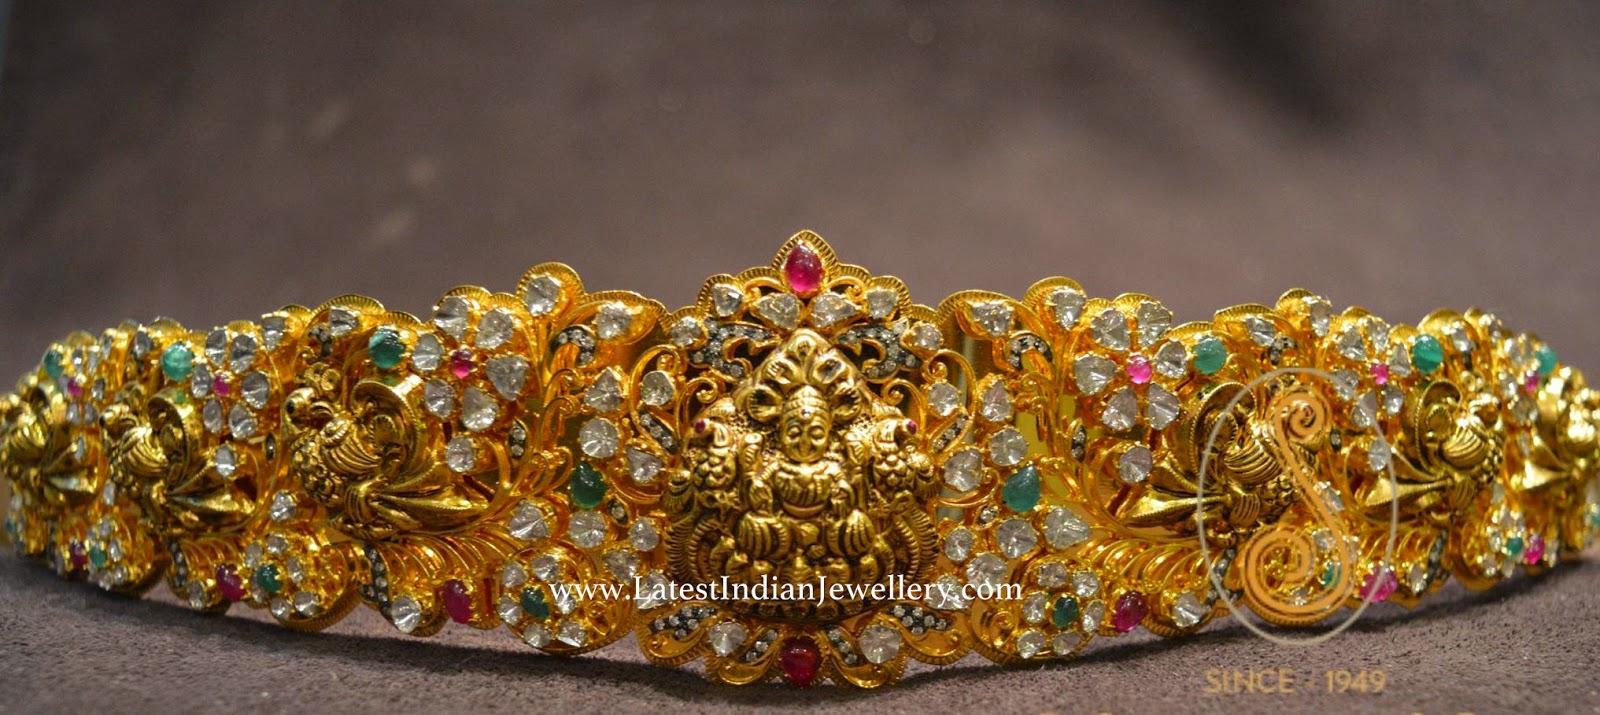 Pachi Work Lakshmi Gold Vaddanam Design